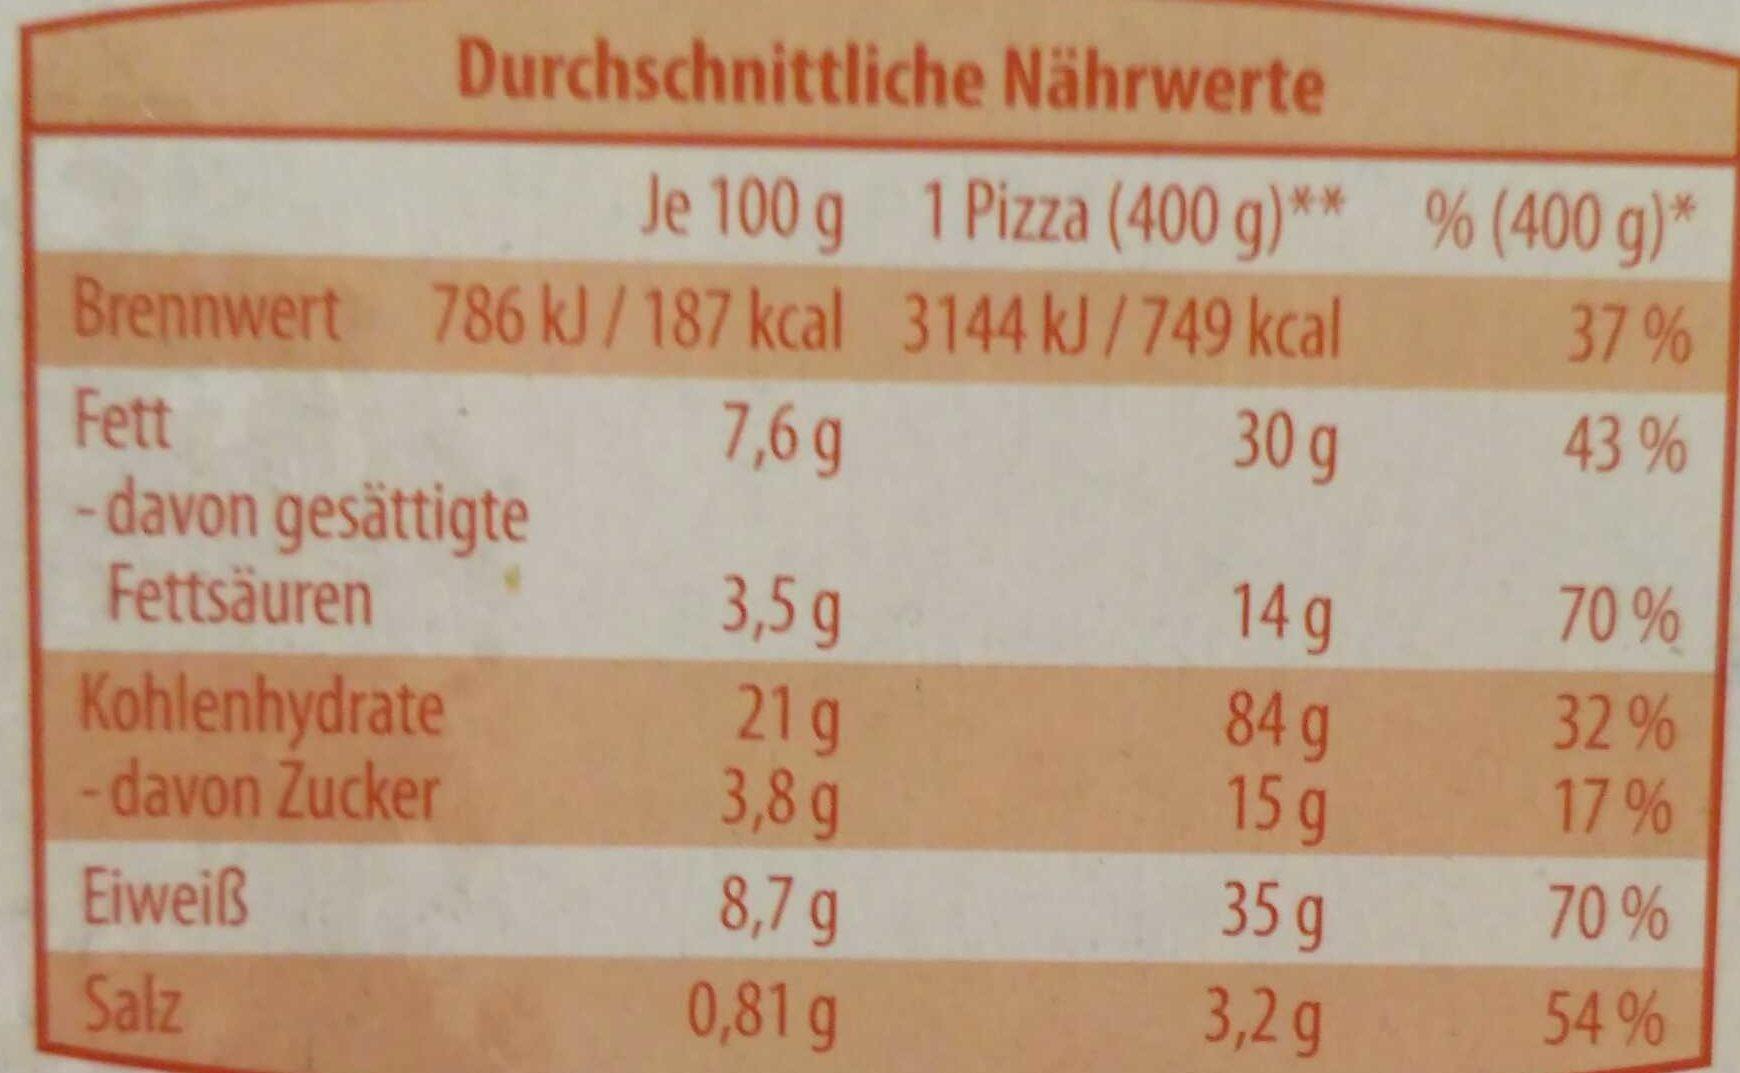 Holzofen Pizza Original Italiana Fantasia - Nutrition facts - de